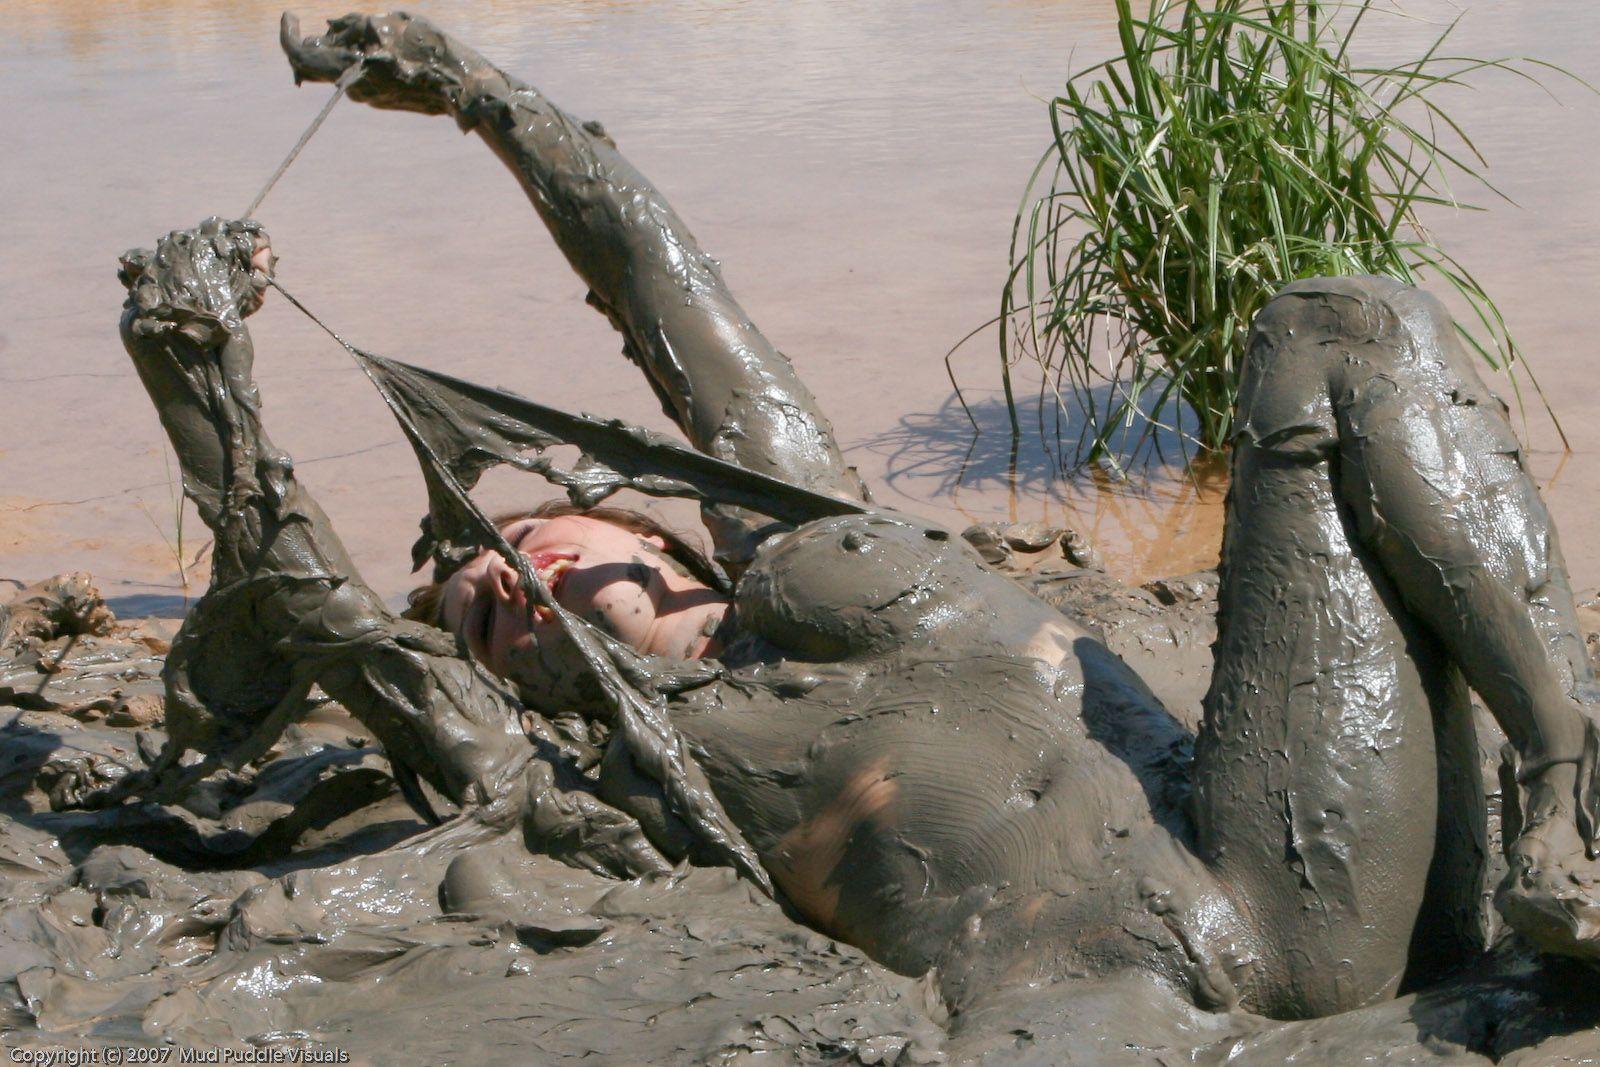 nude girls photos on mud trucks free